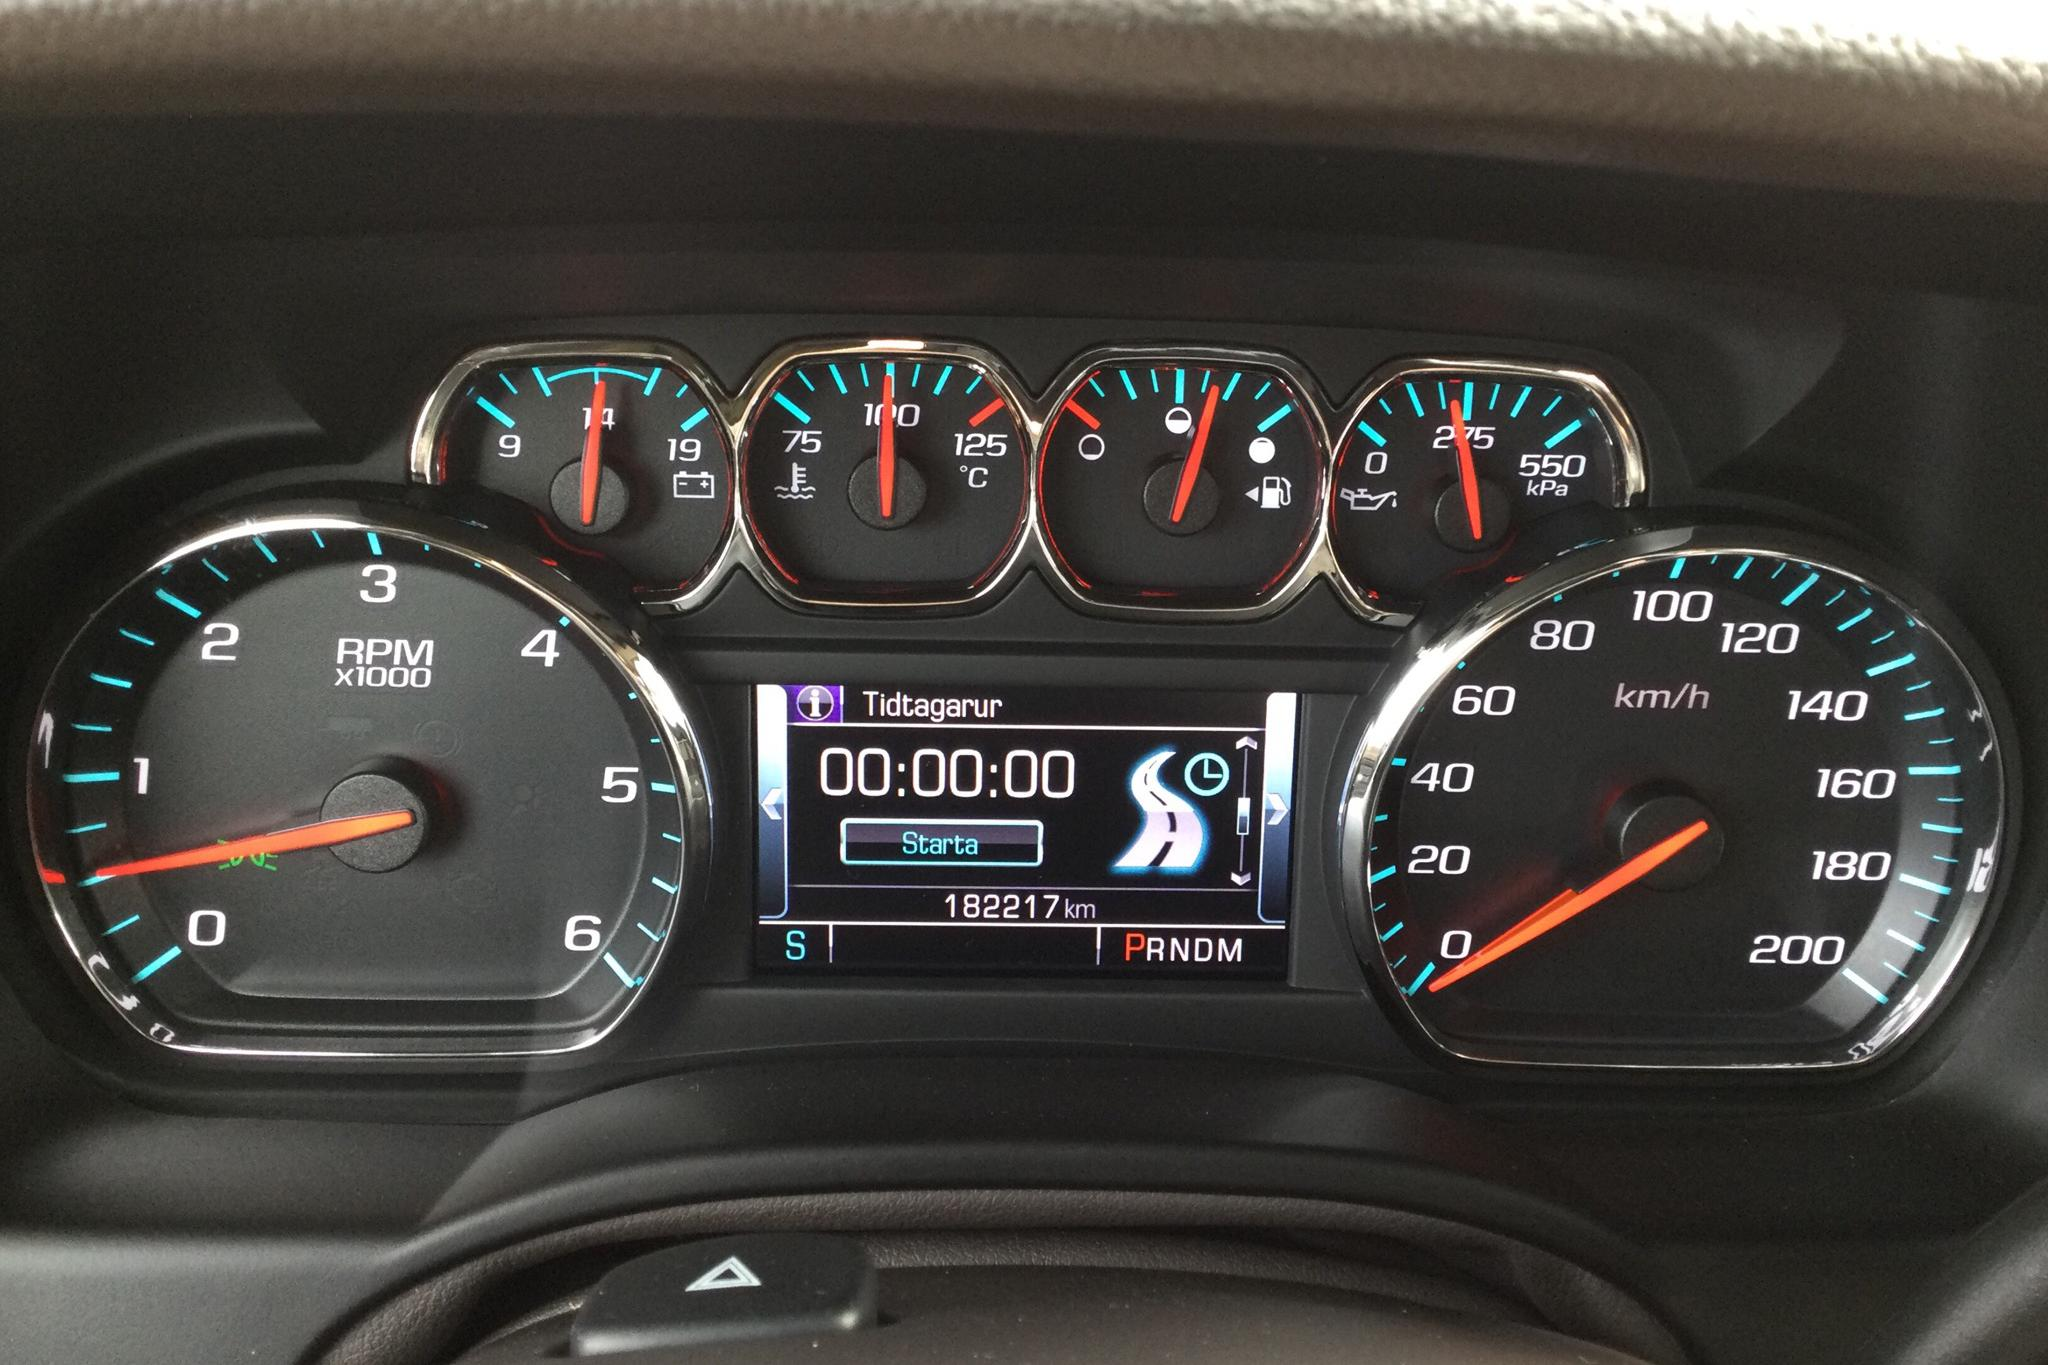 Chevrolet Suburban 5.3 4WD Hydra-Matic (360hk) - 182 210 km - Automatic - white - 2015